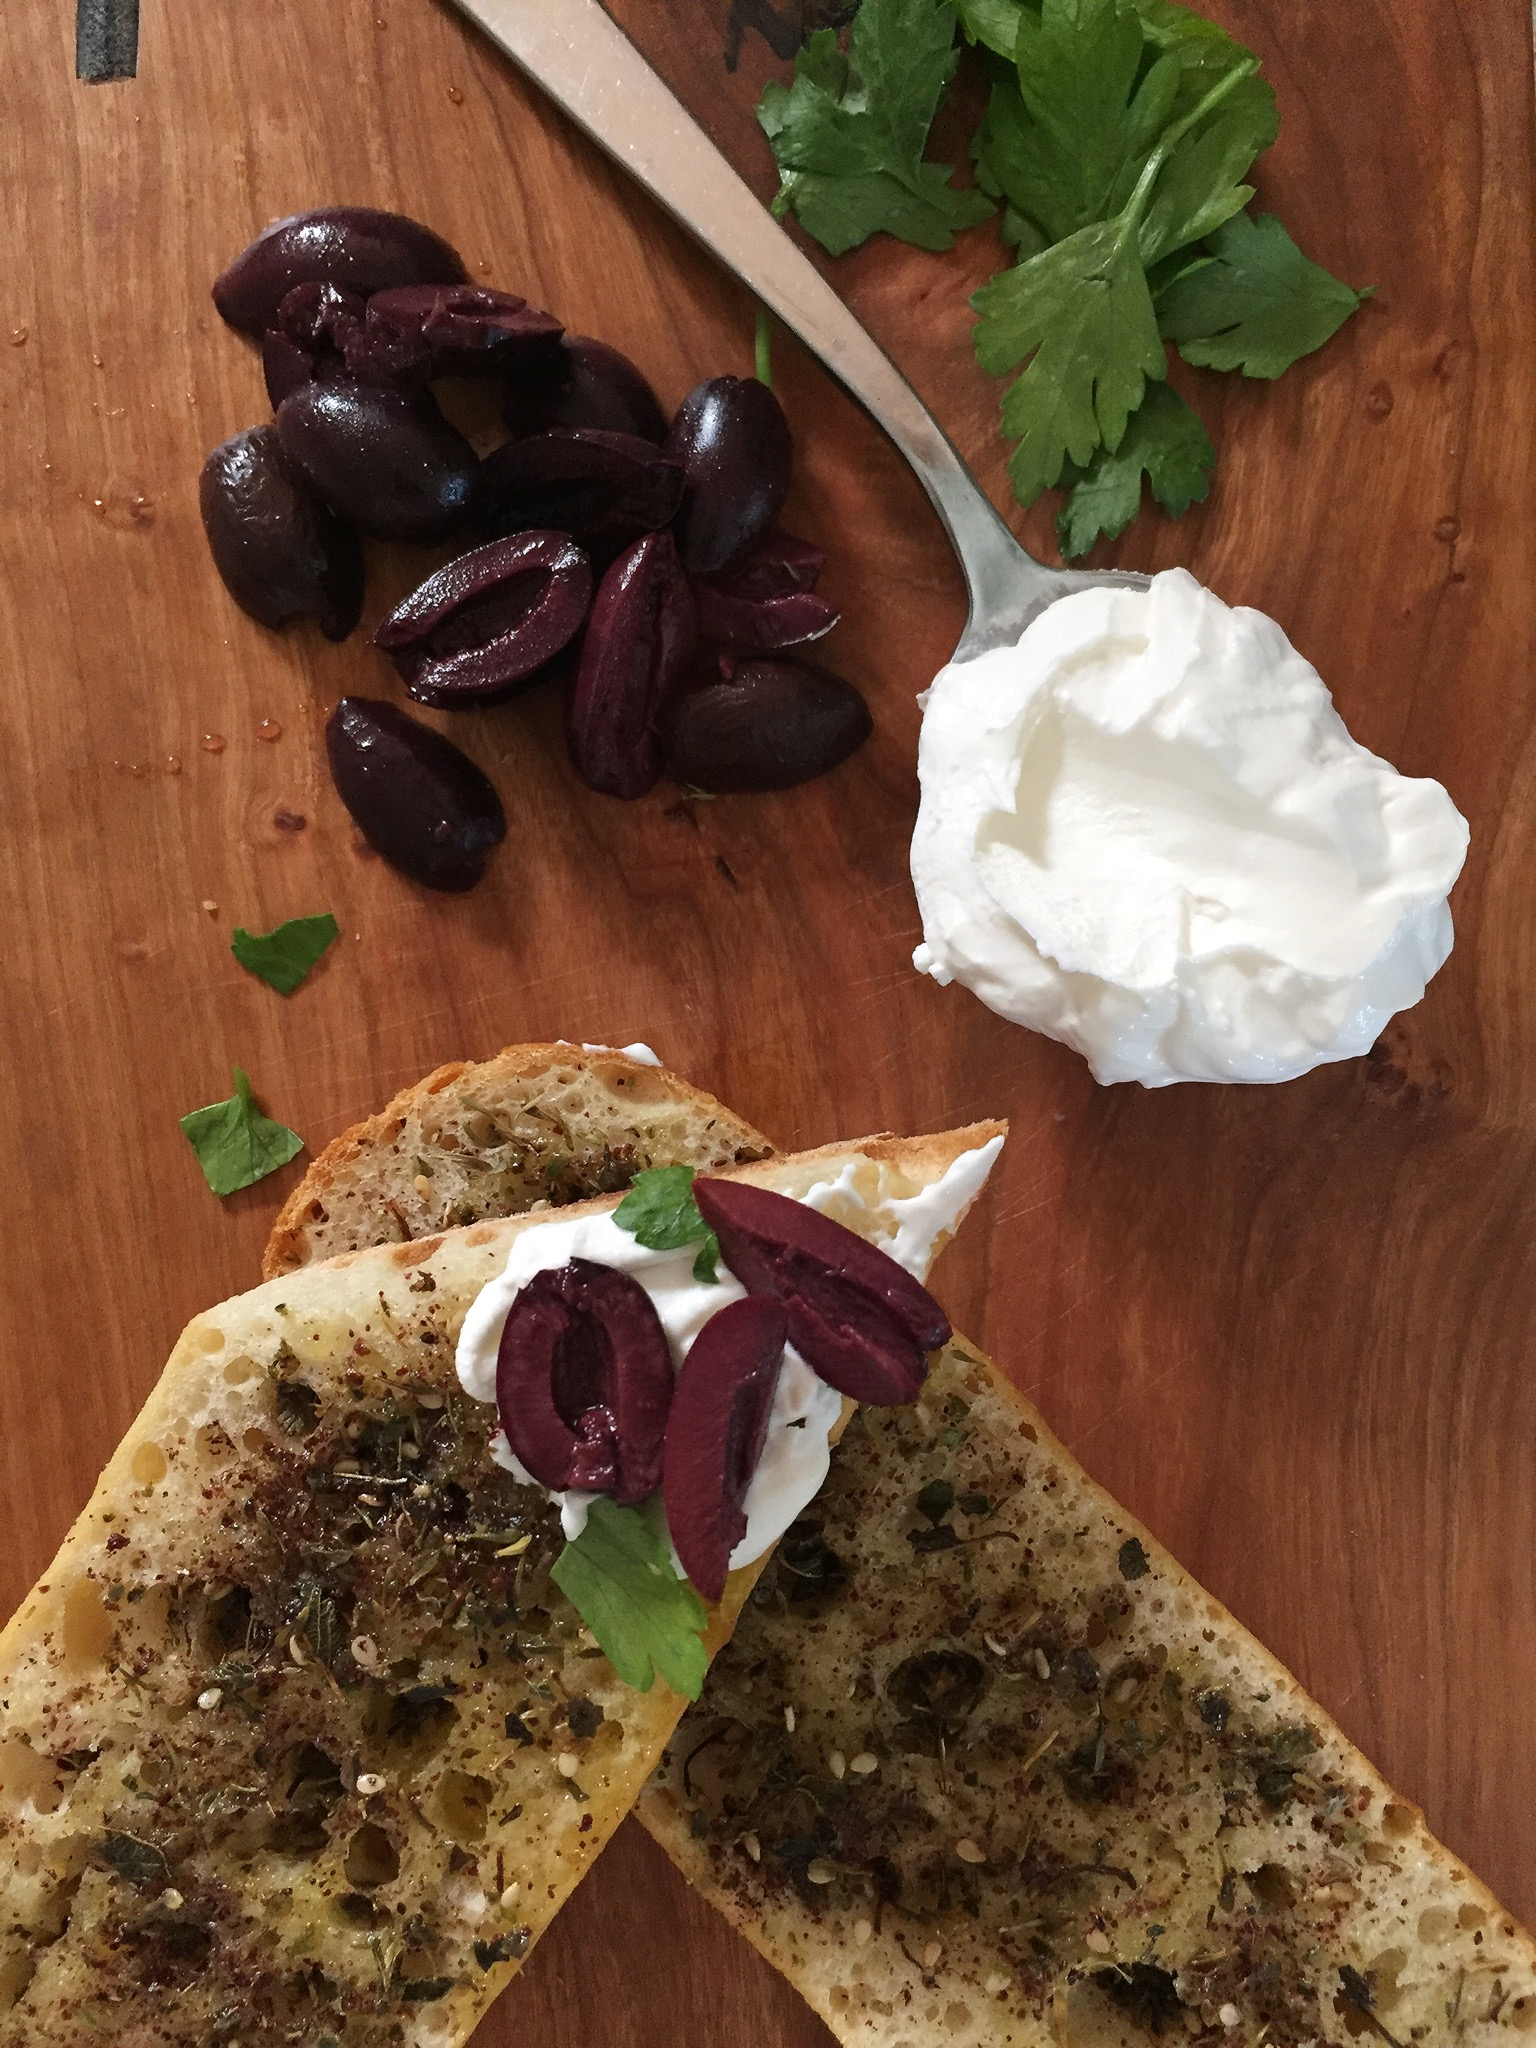 NEW WAYS to 'TOAST' Olive, Labneh, and Za'atar // laurenariza.com // RECIPE SCHMECIPE